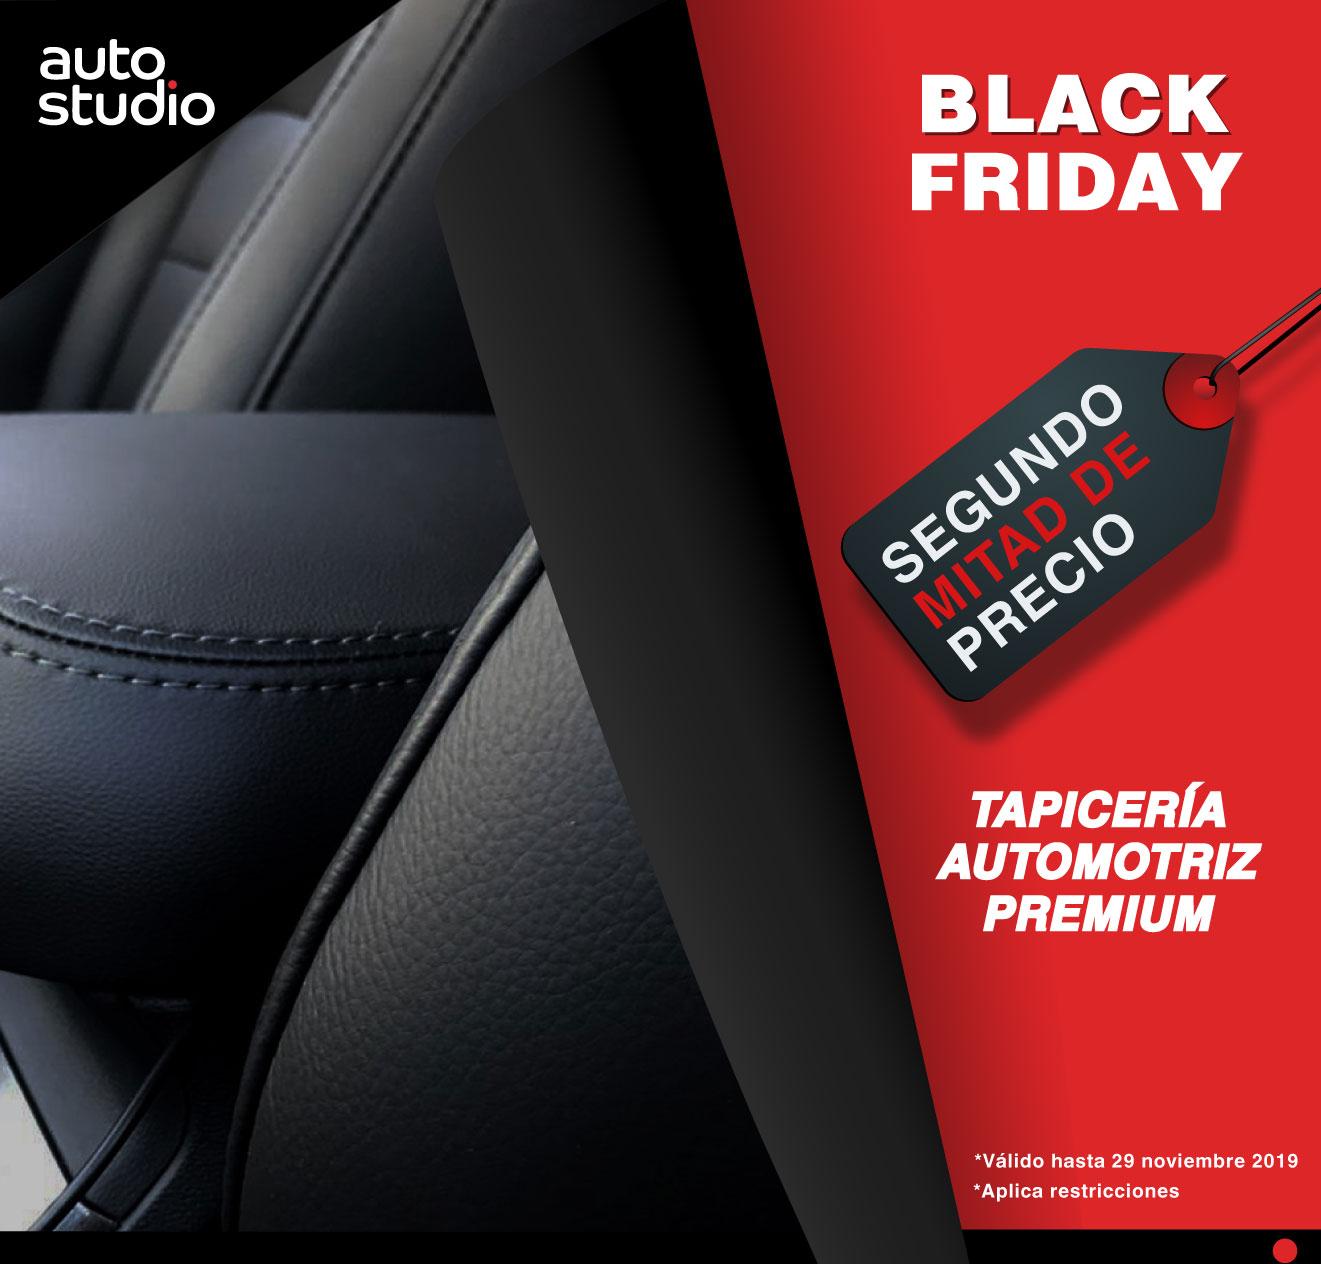 black-friday-segundo-mitad-precio-tapiceria